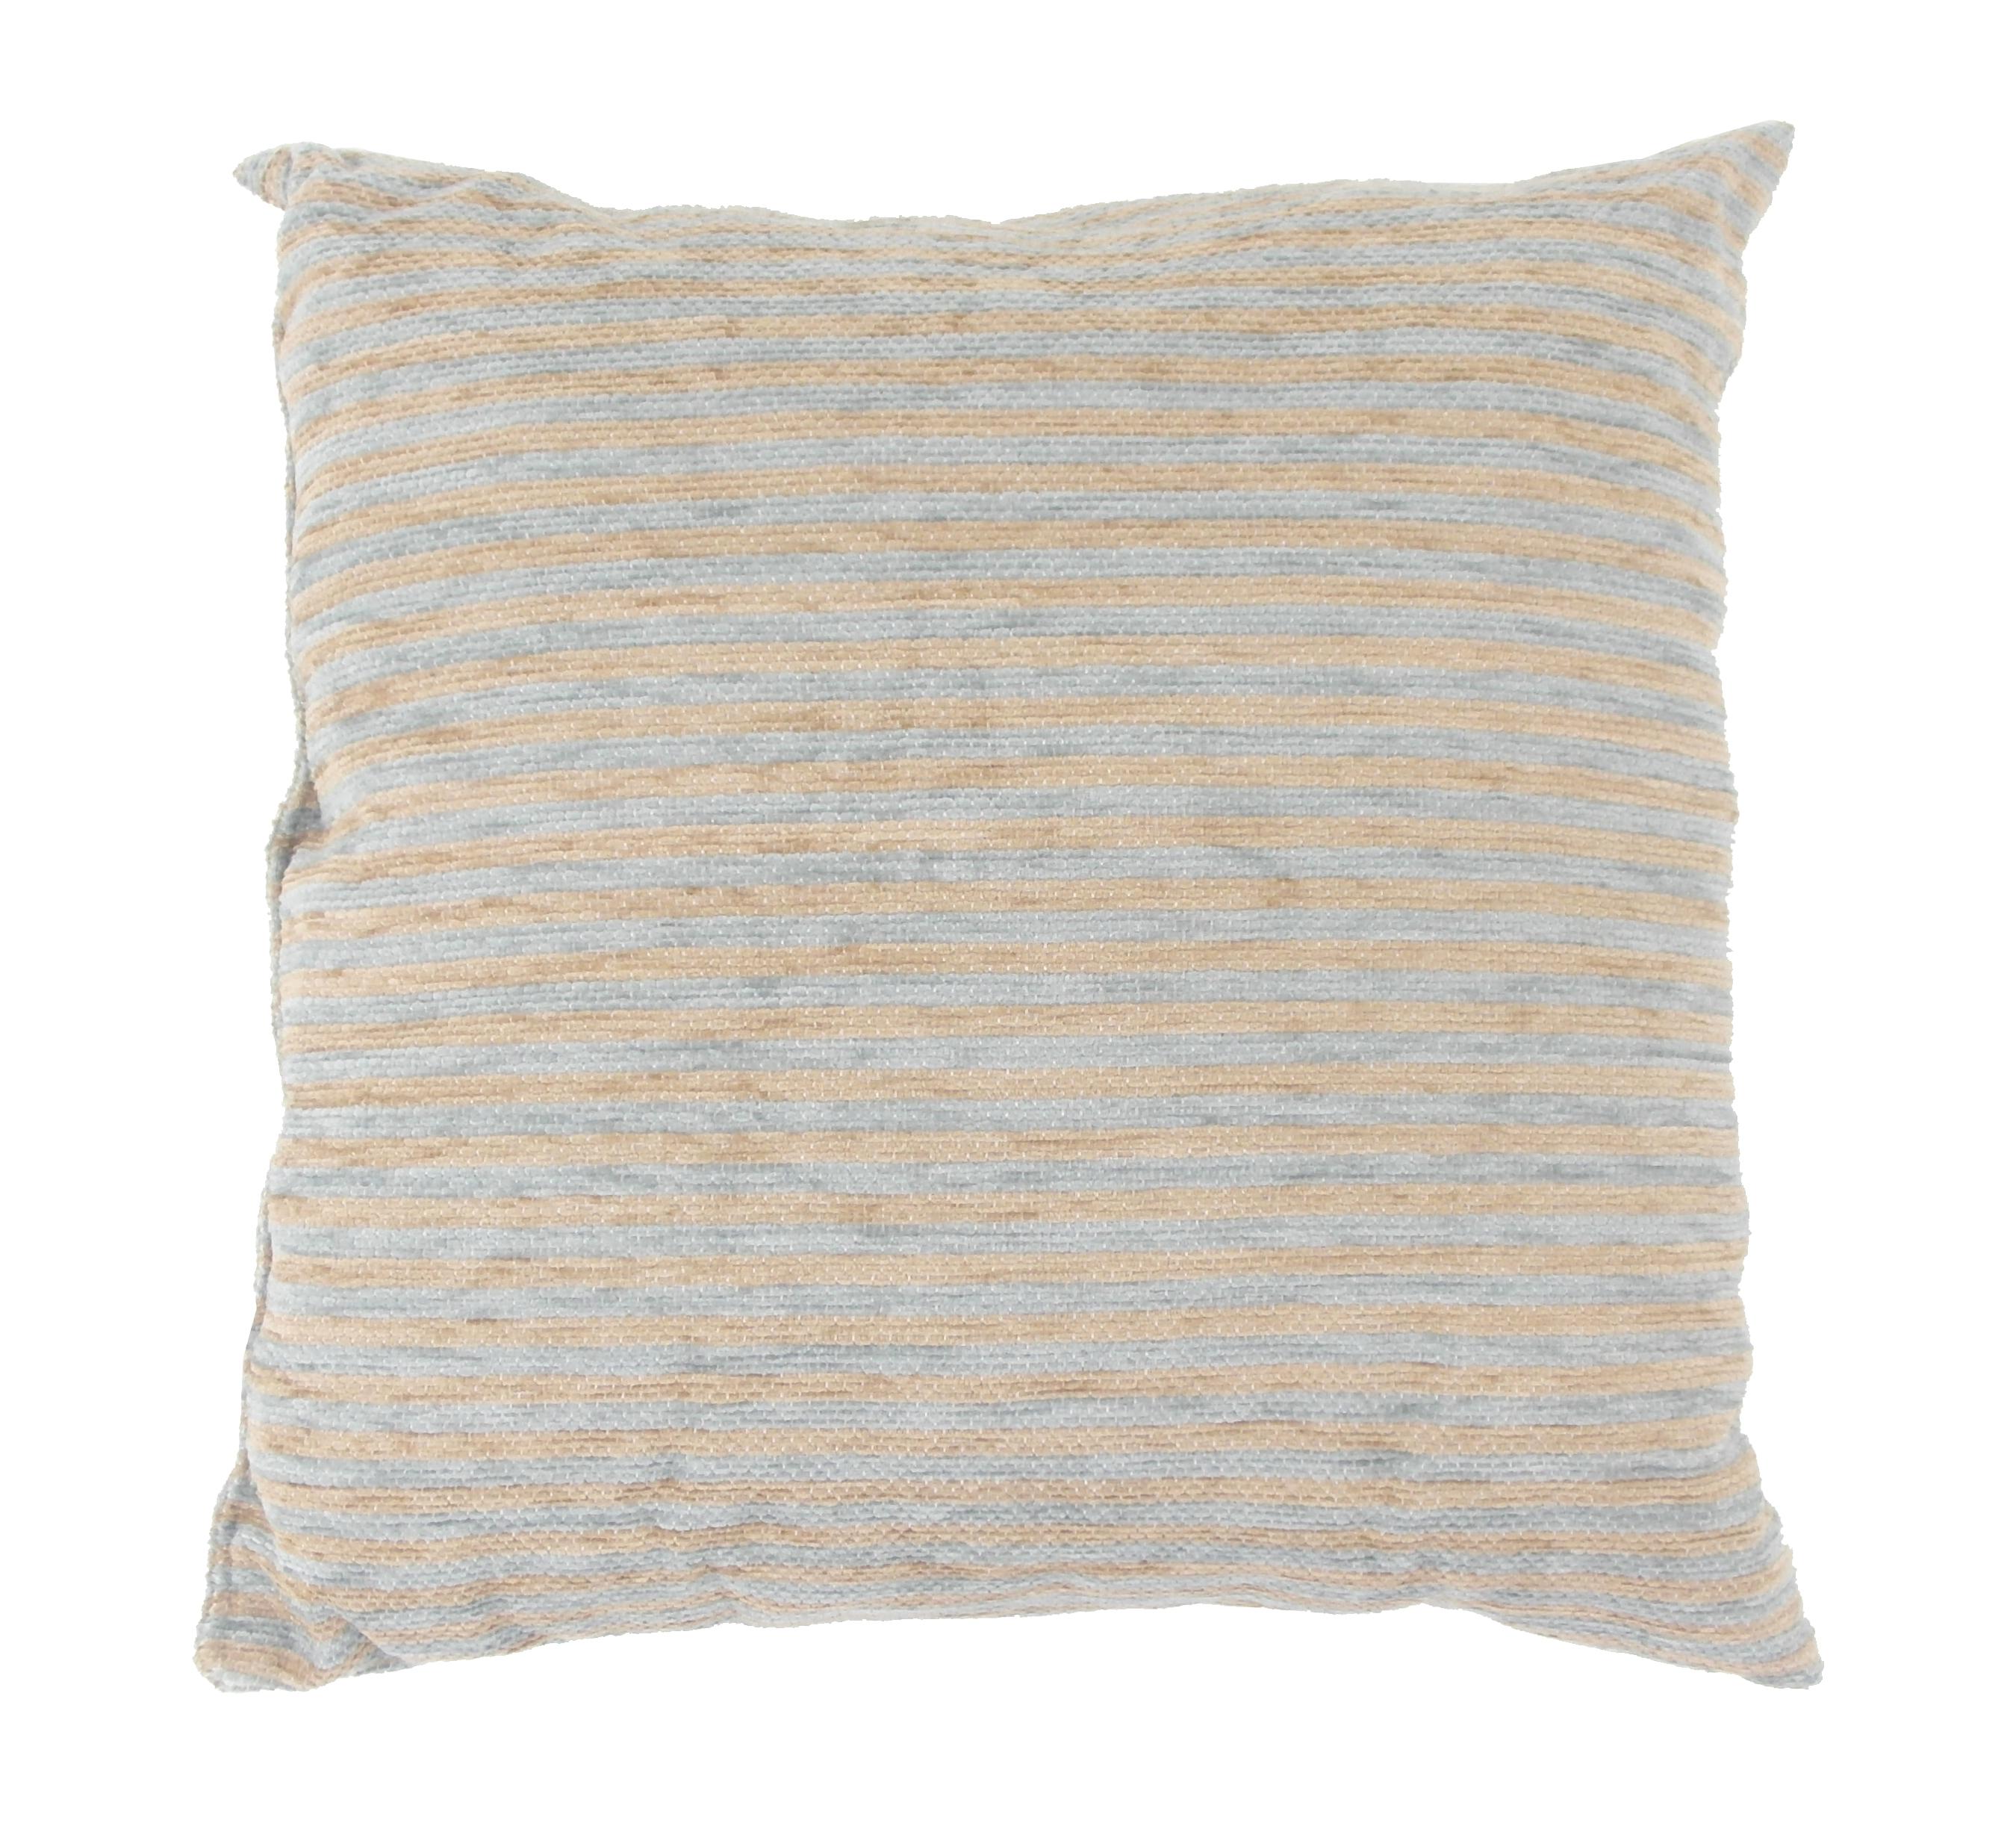 dekokissen sofakissen kissen inkl f llung 40x40 strukturiert erdt ne ebay. Black Bedroom Furniture Sets. Home Design Ideas